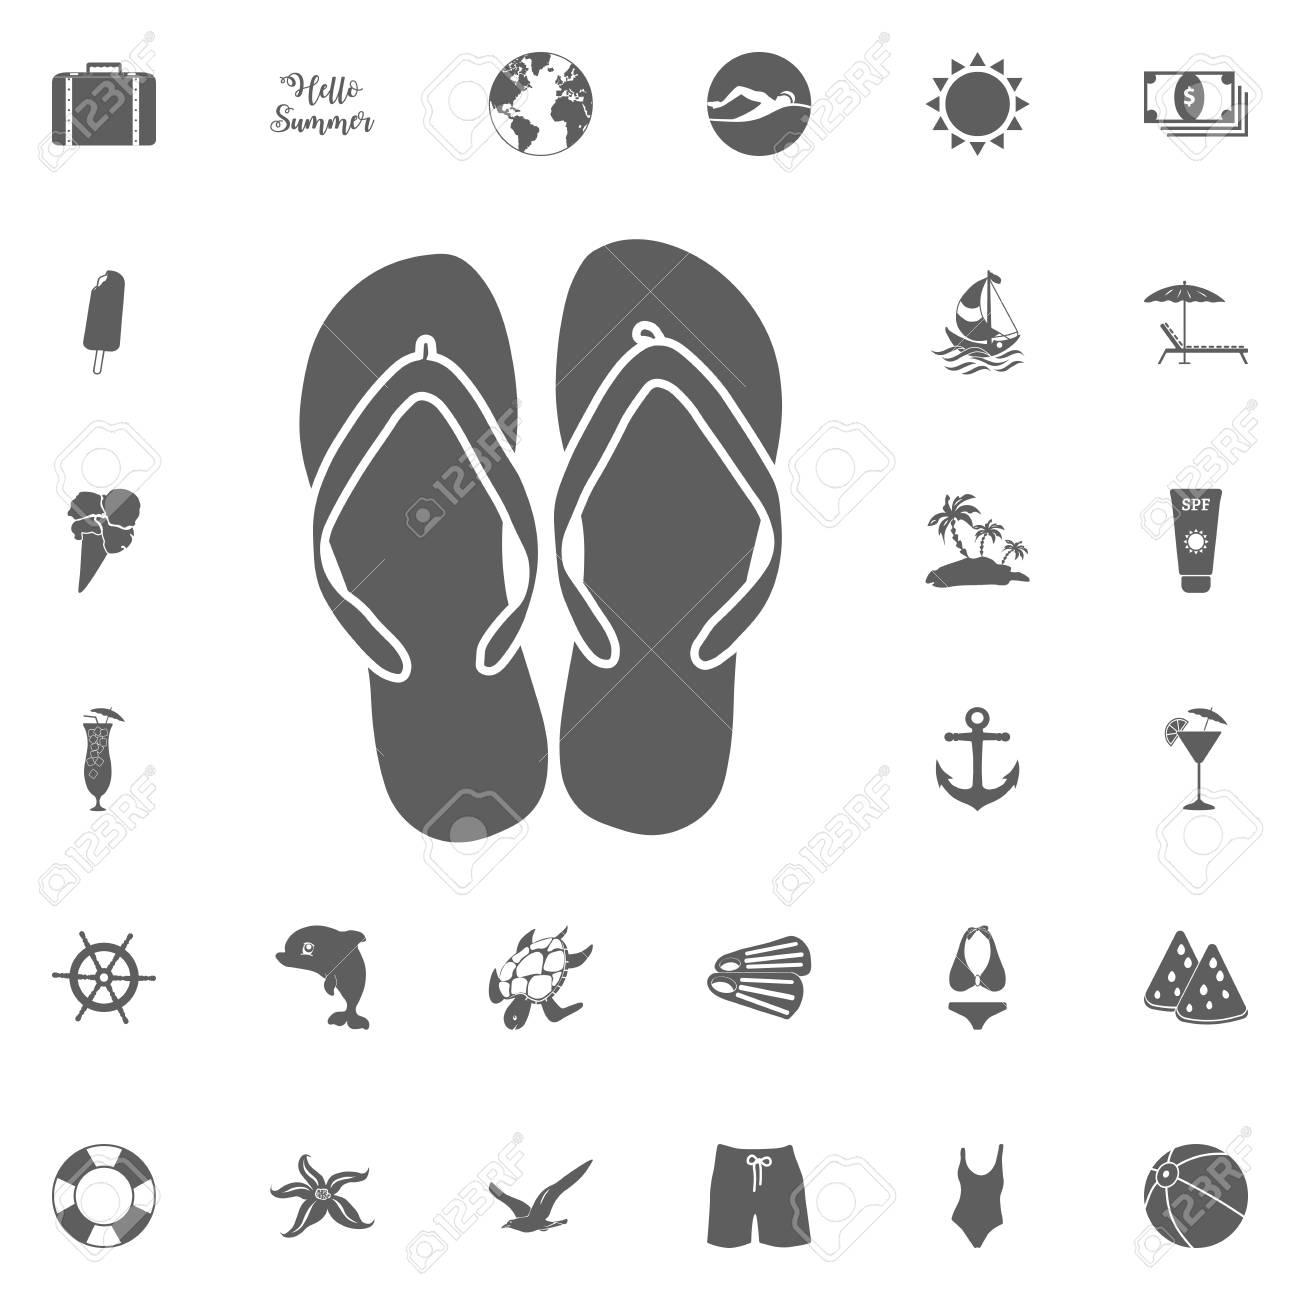 8e58d5c258b594 summer vacations vector illustration. Hello summer icon. Beach icon set. travel  icons set